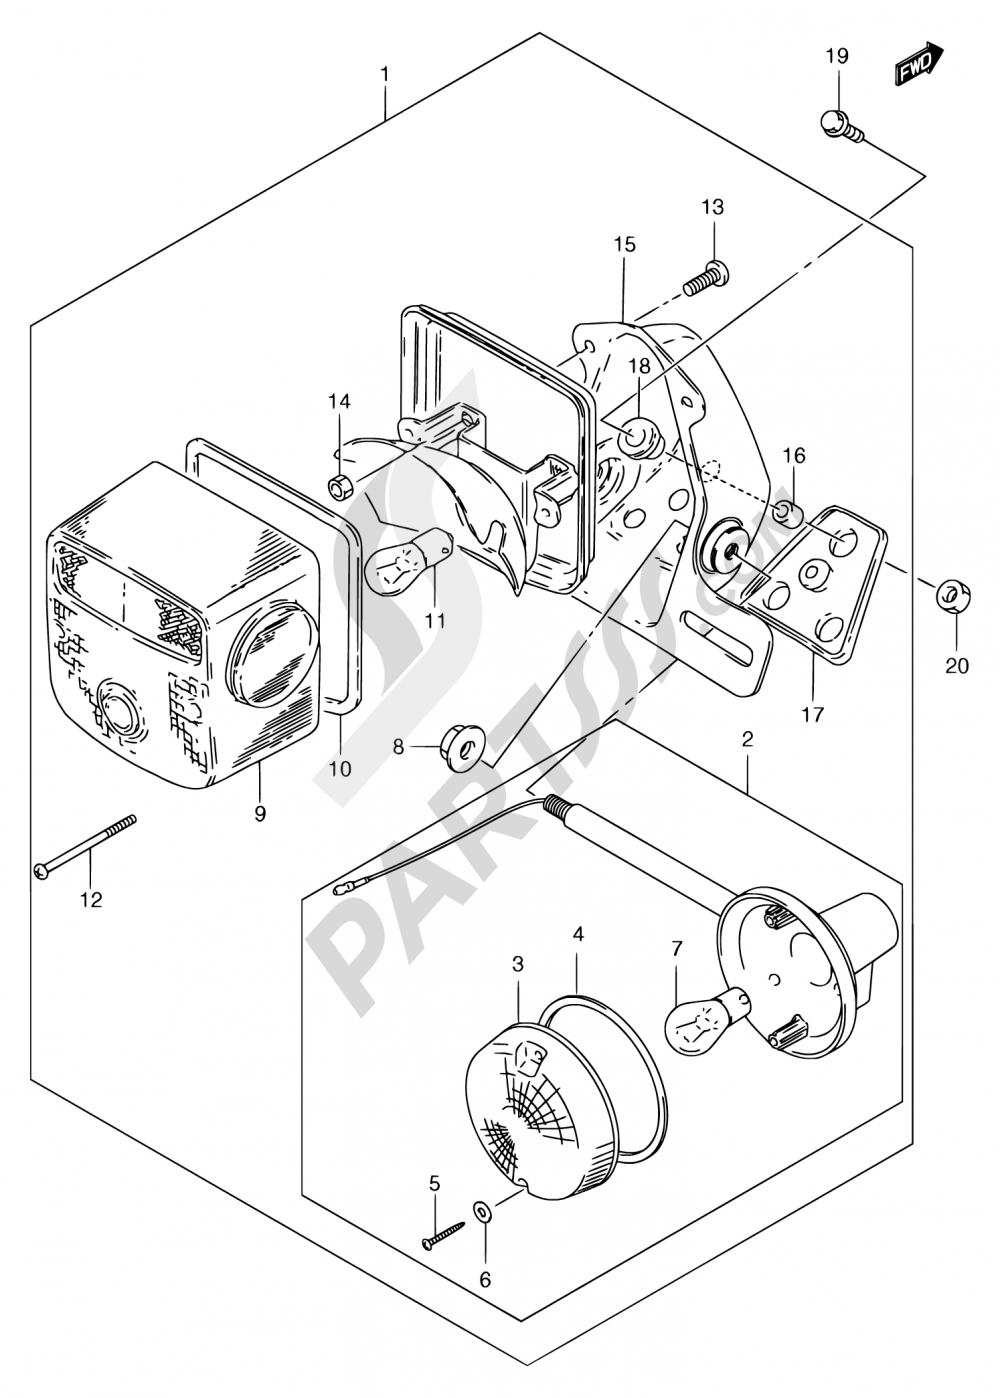 29A - REAR COMBINATION & REAR TURN SIGNAL LAMP (MODEL Y/K1) Suzuki GN250E 2000